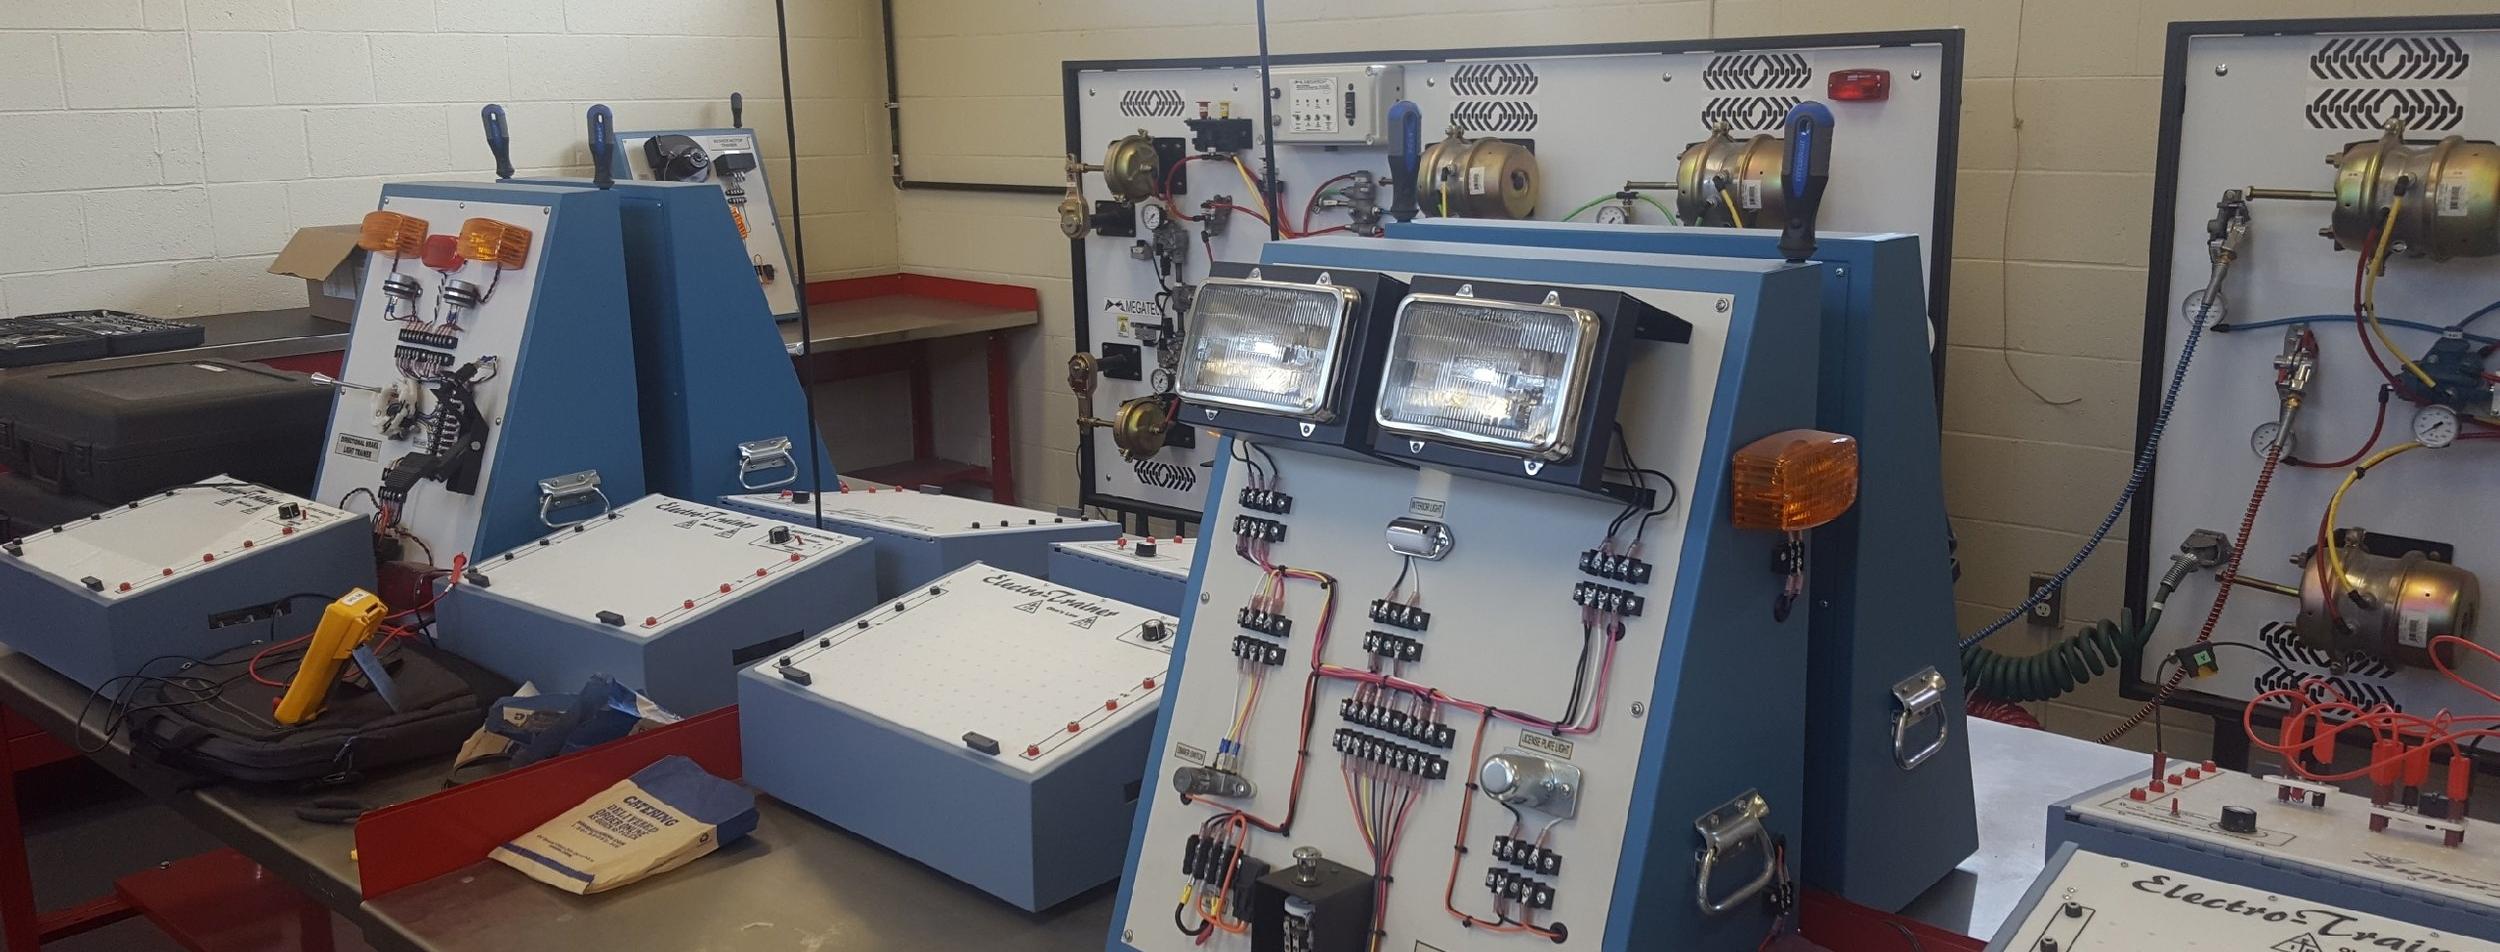 Ventura College setup (2).JPG